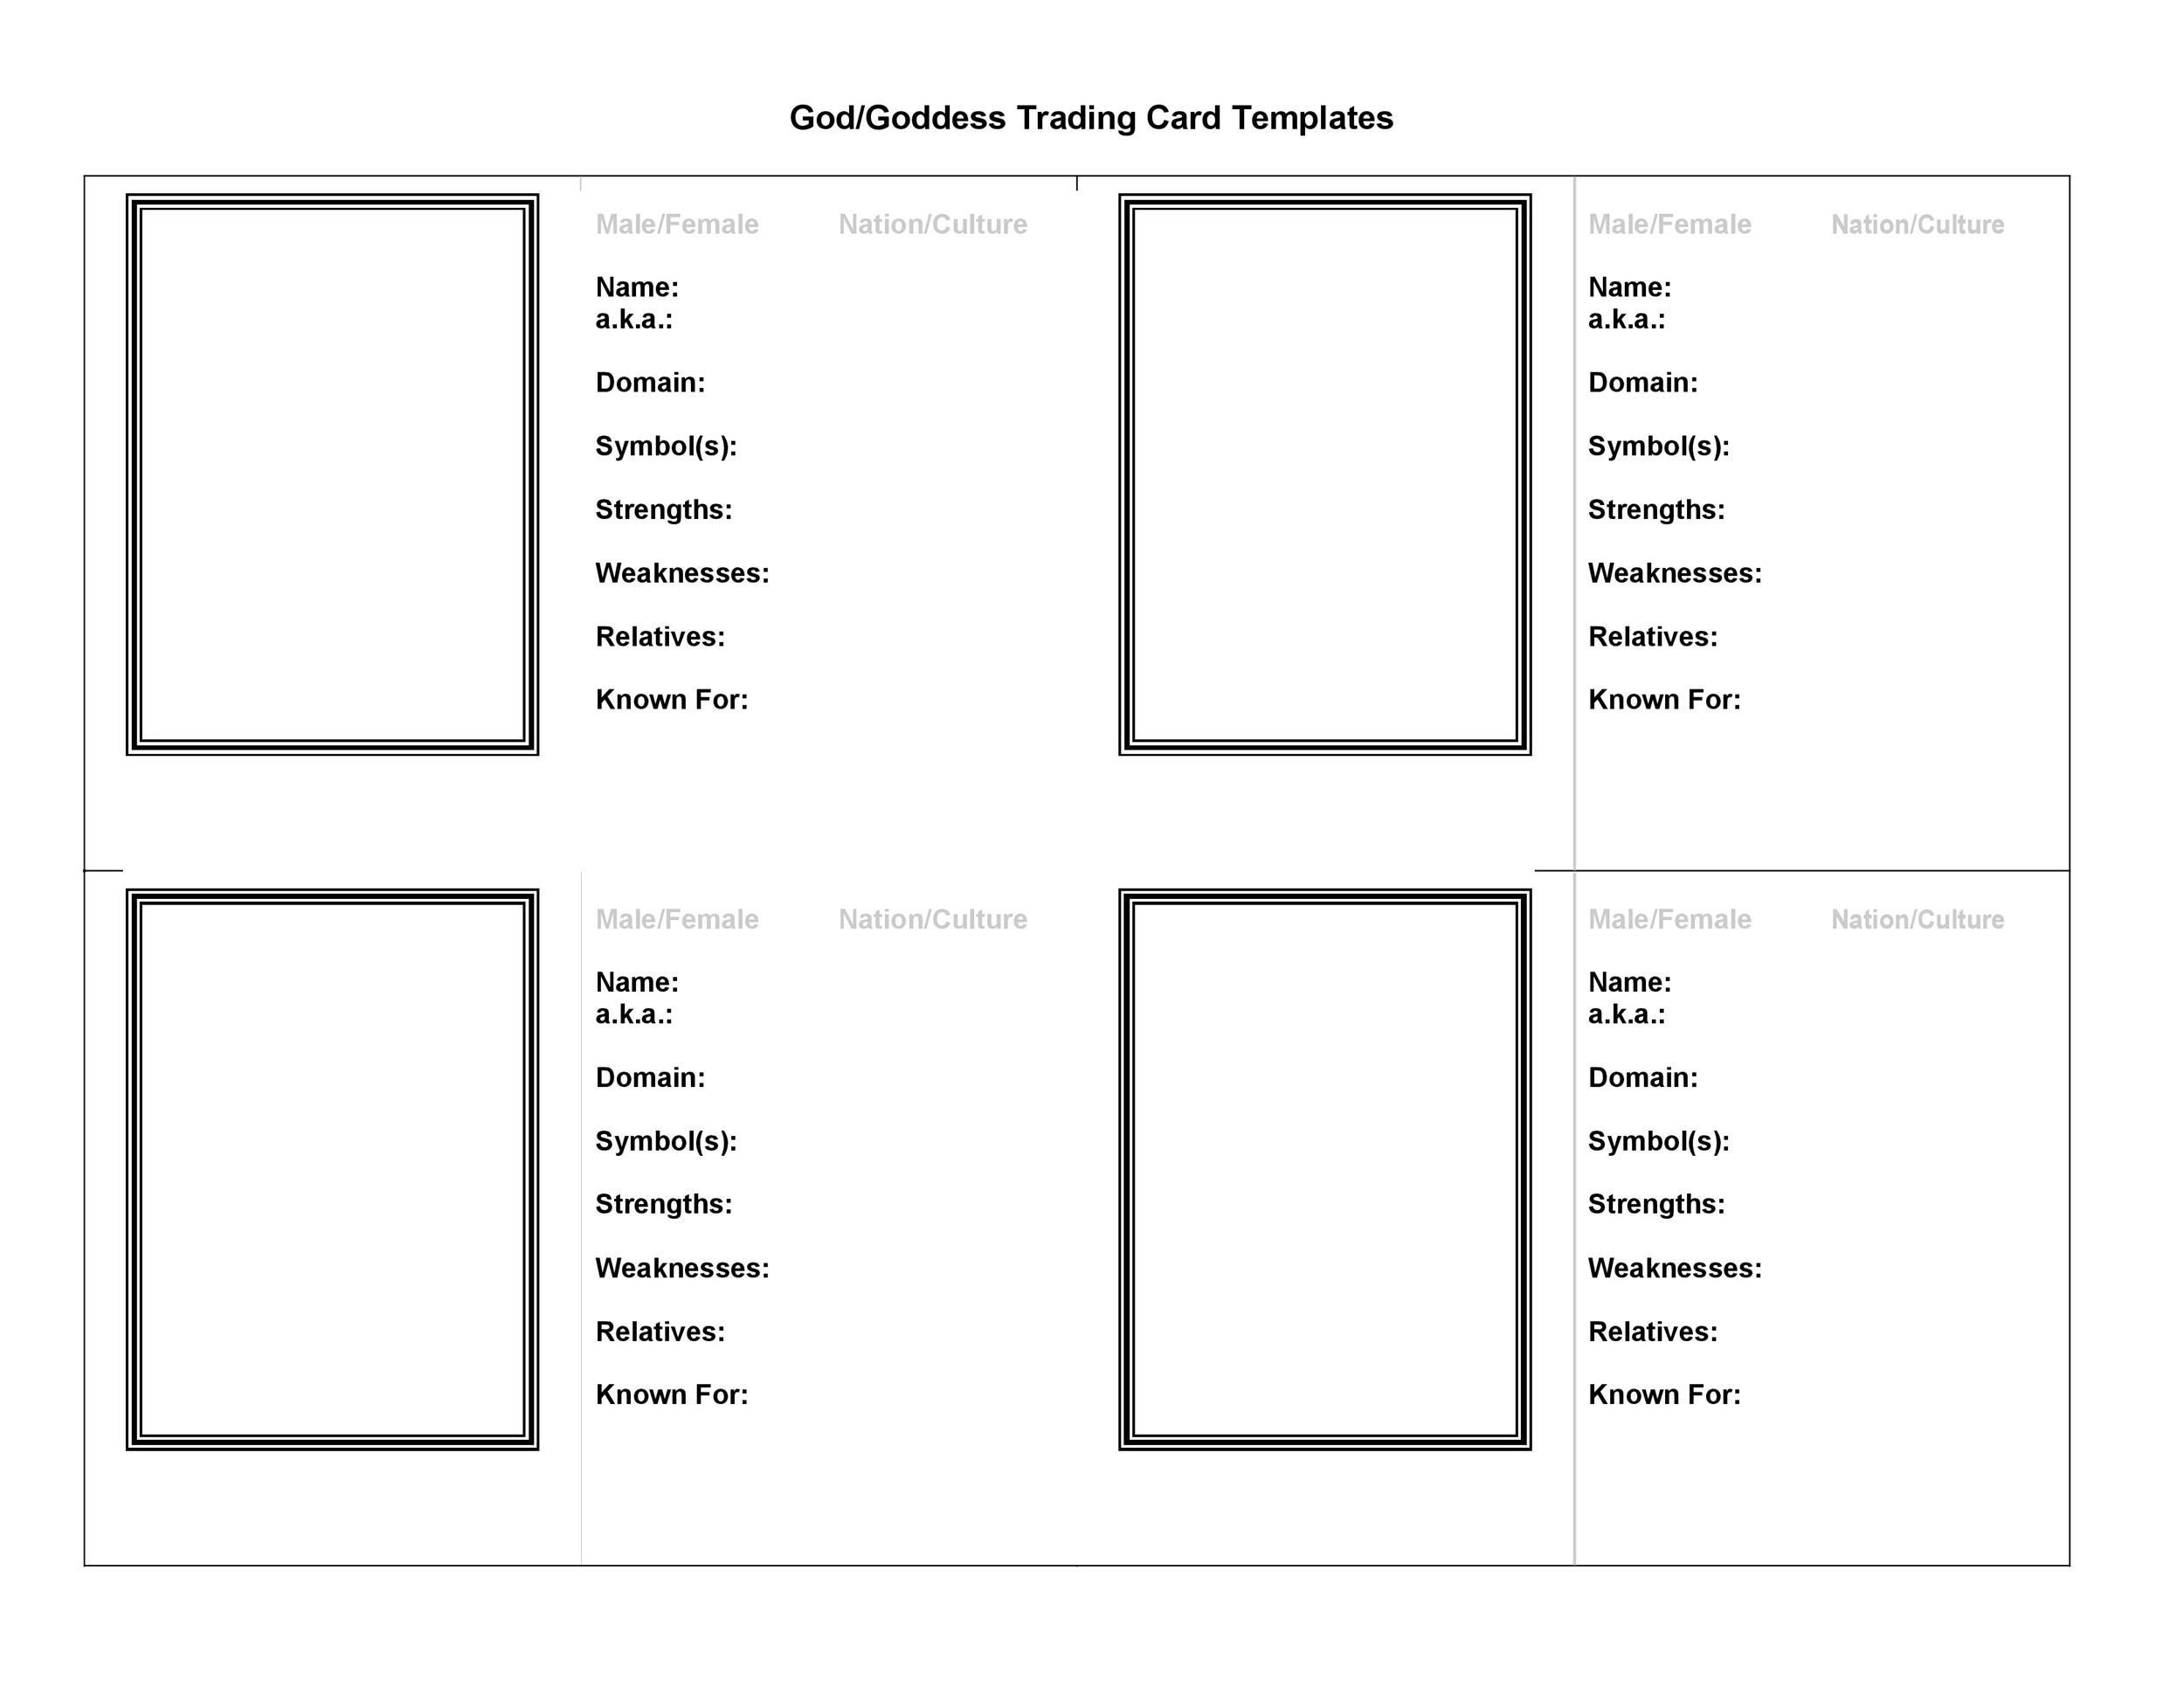 33 Free Trading Card Templates (Baseball, Football, etc